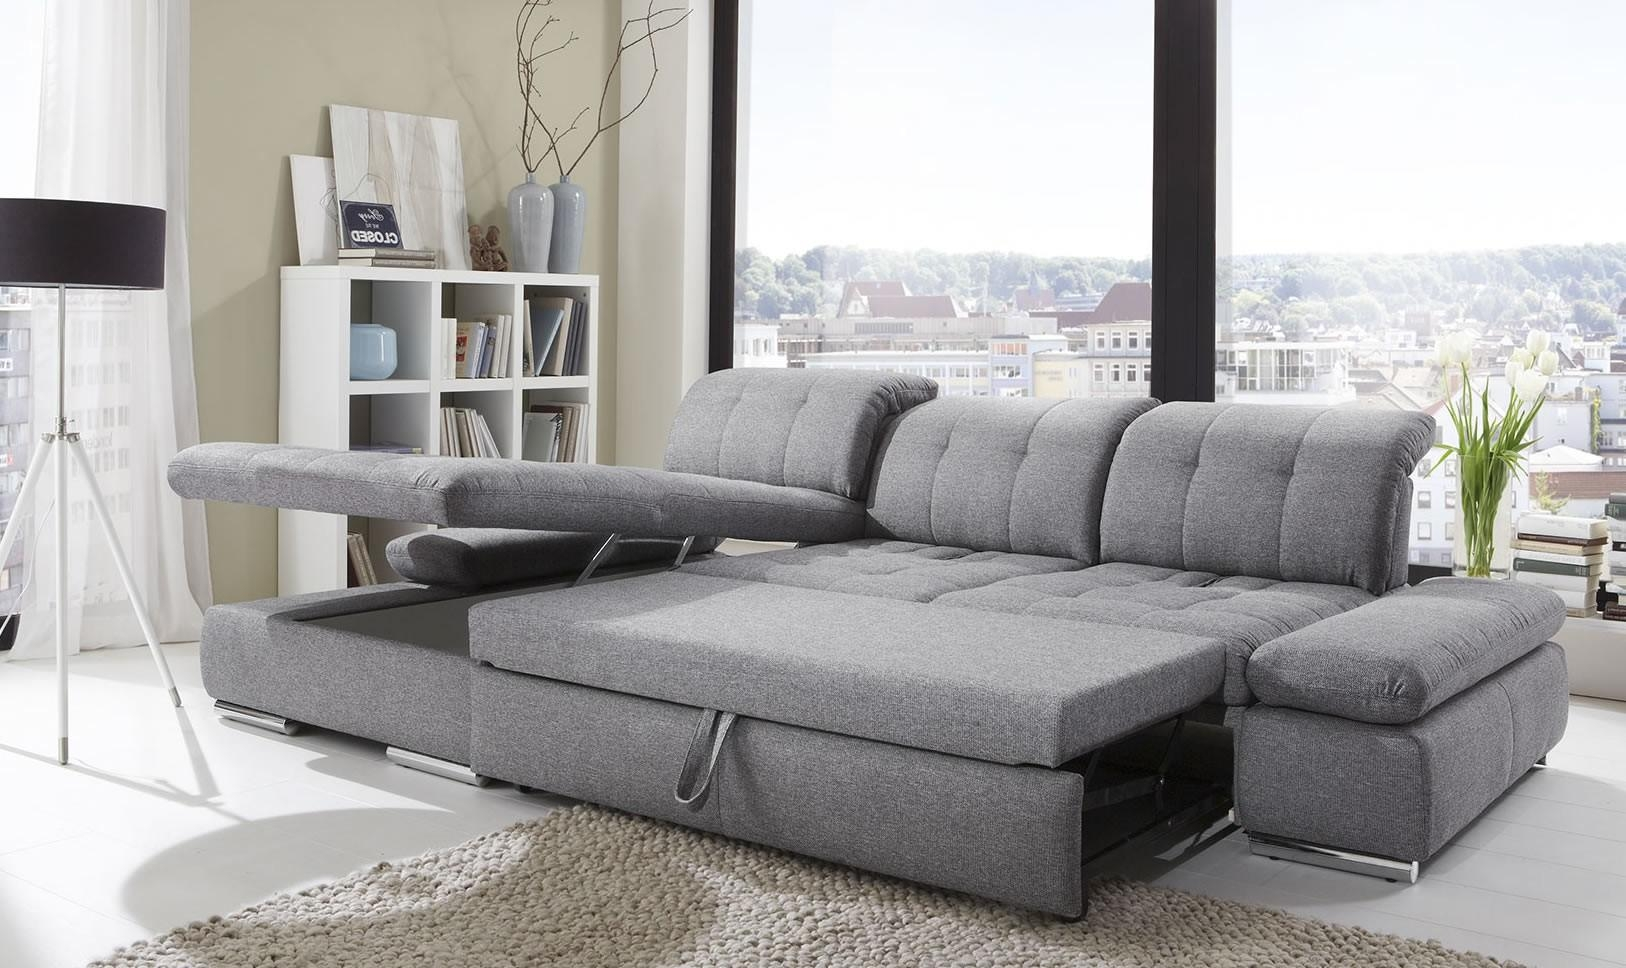 sofa sleeper san francisco children s fold out nz 20 photos sofas diego ideas